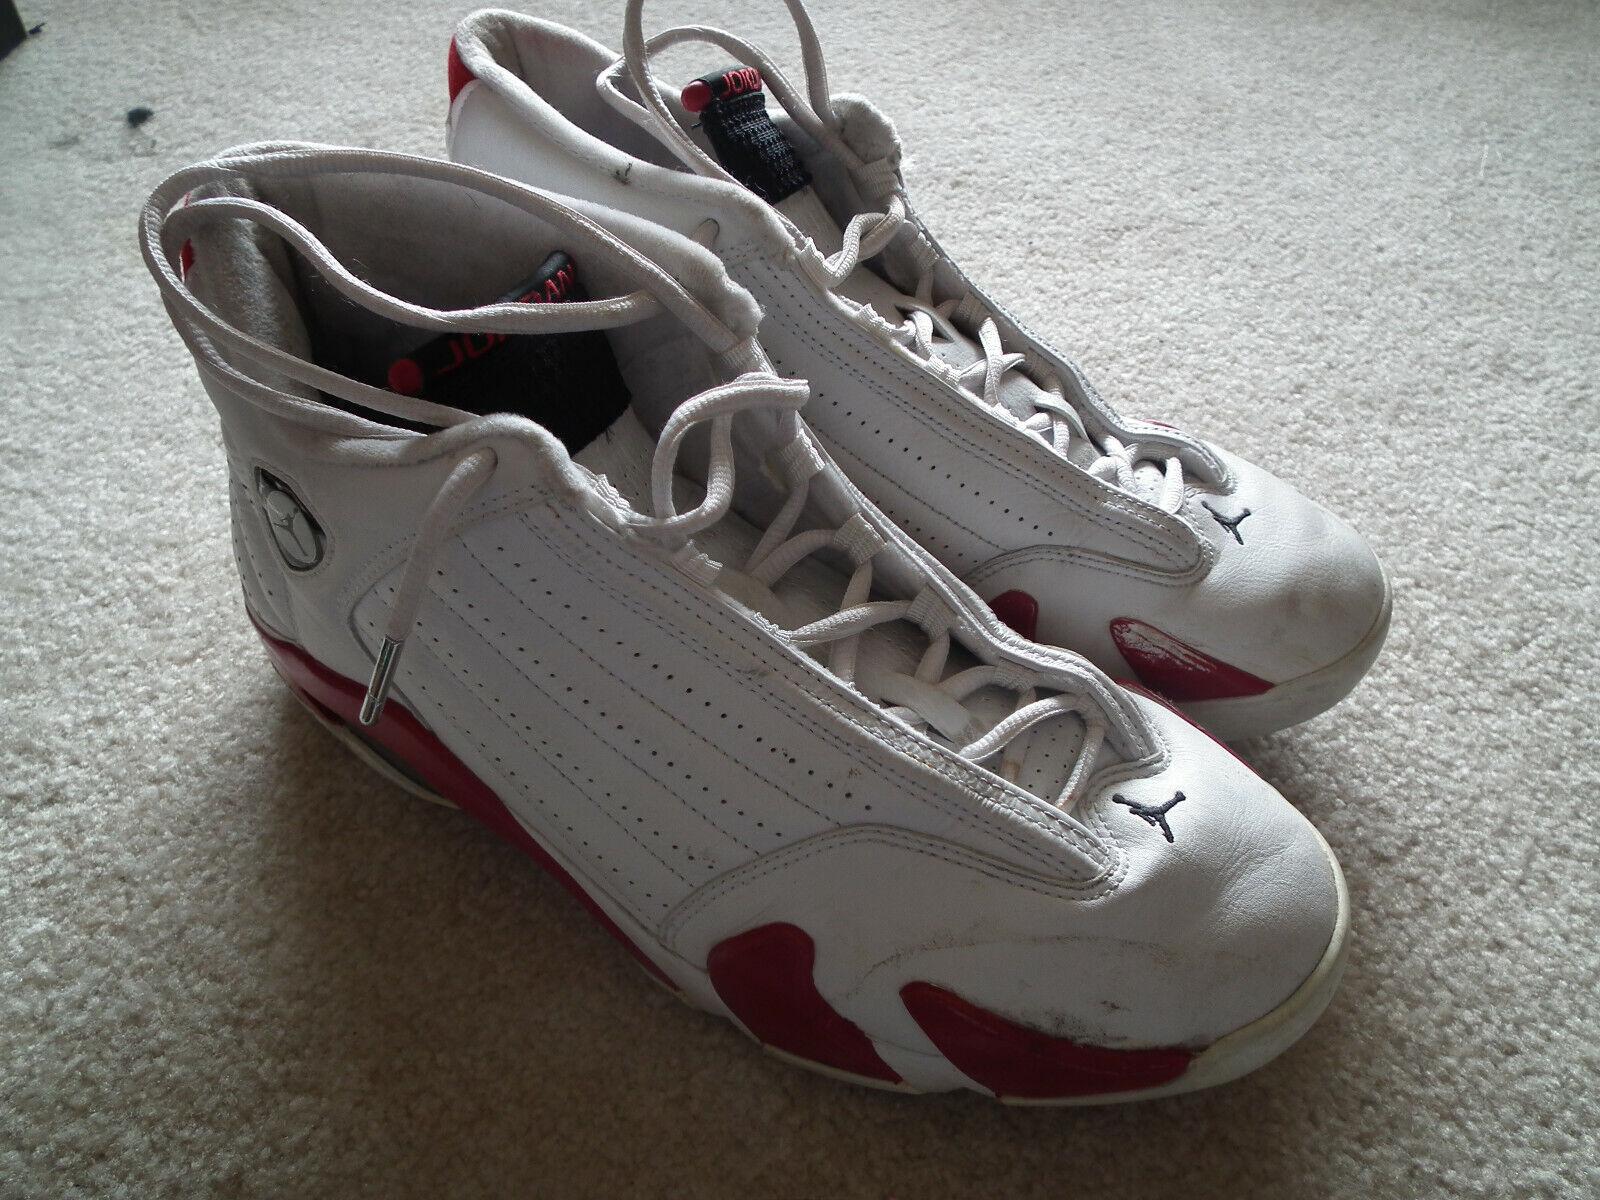 Nike Air Jordan 14 XIV 2006 White, Black, Var Red 311832-101 Size 11 Authentic